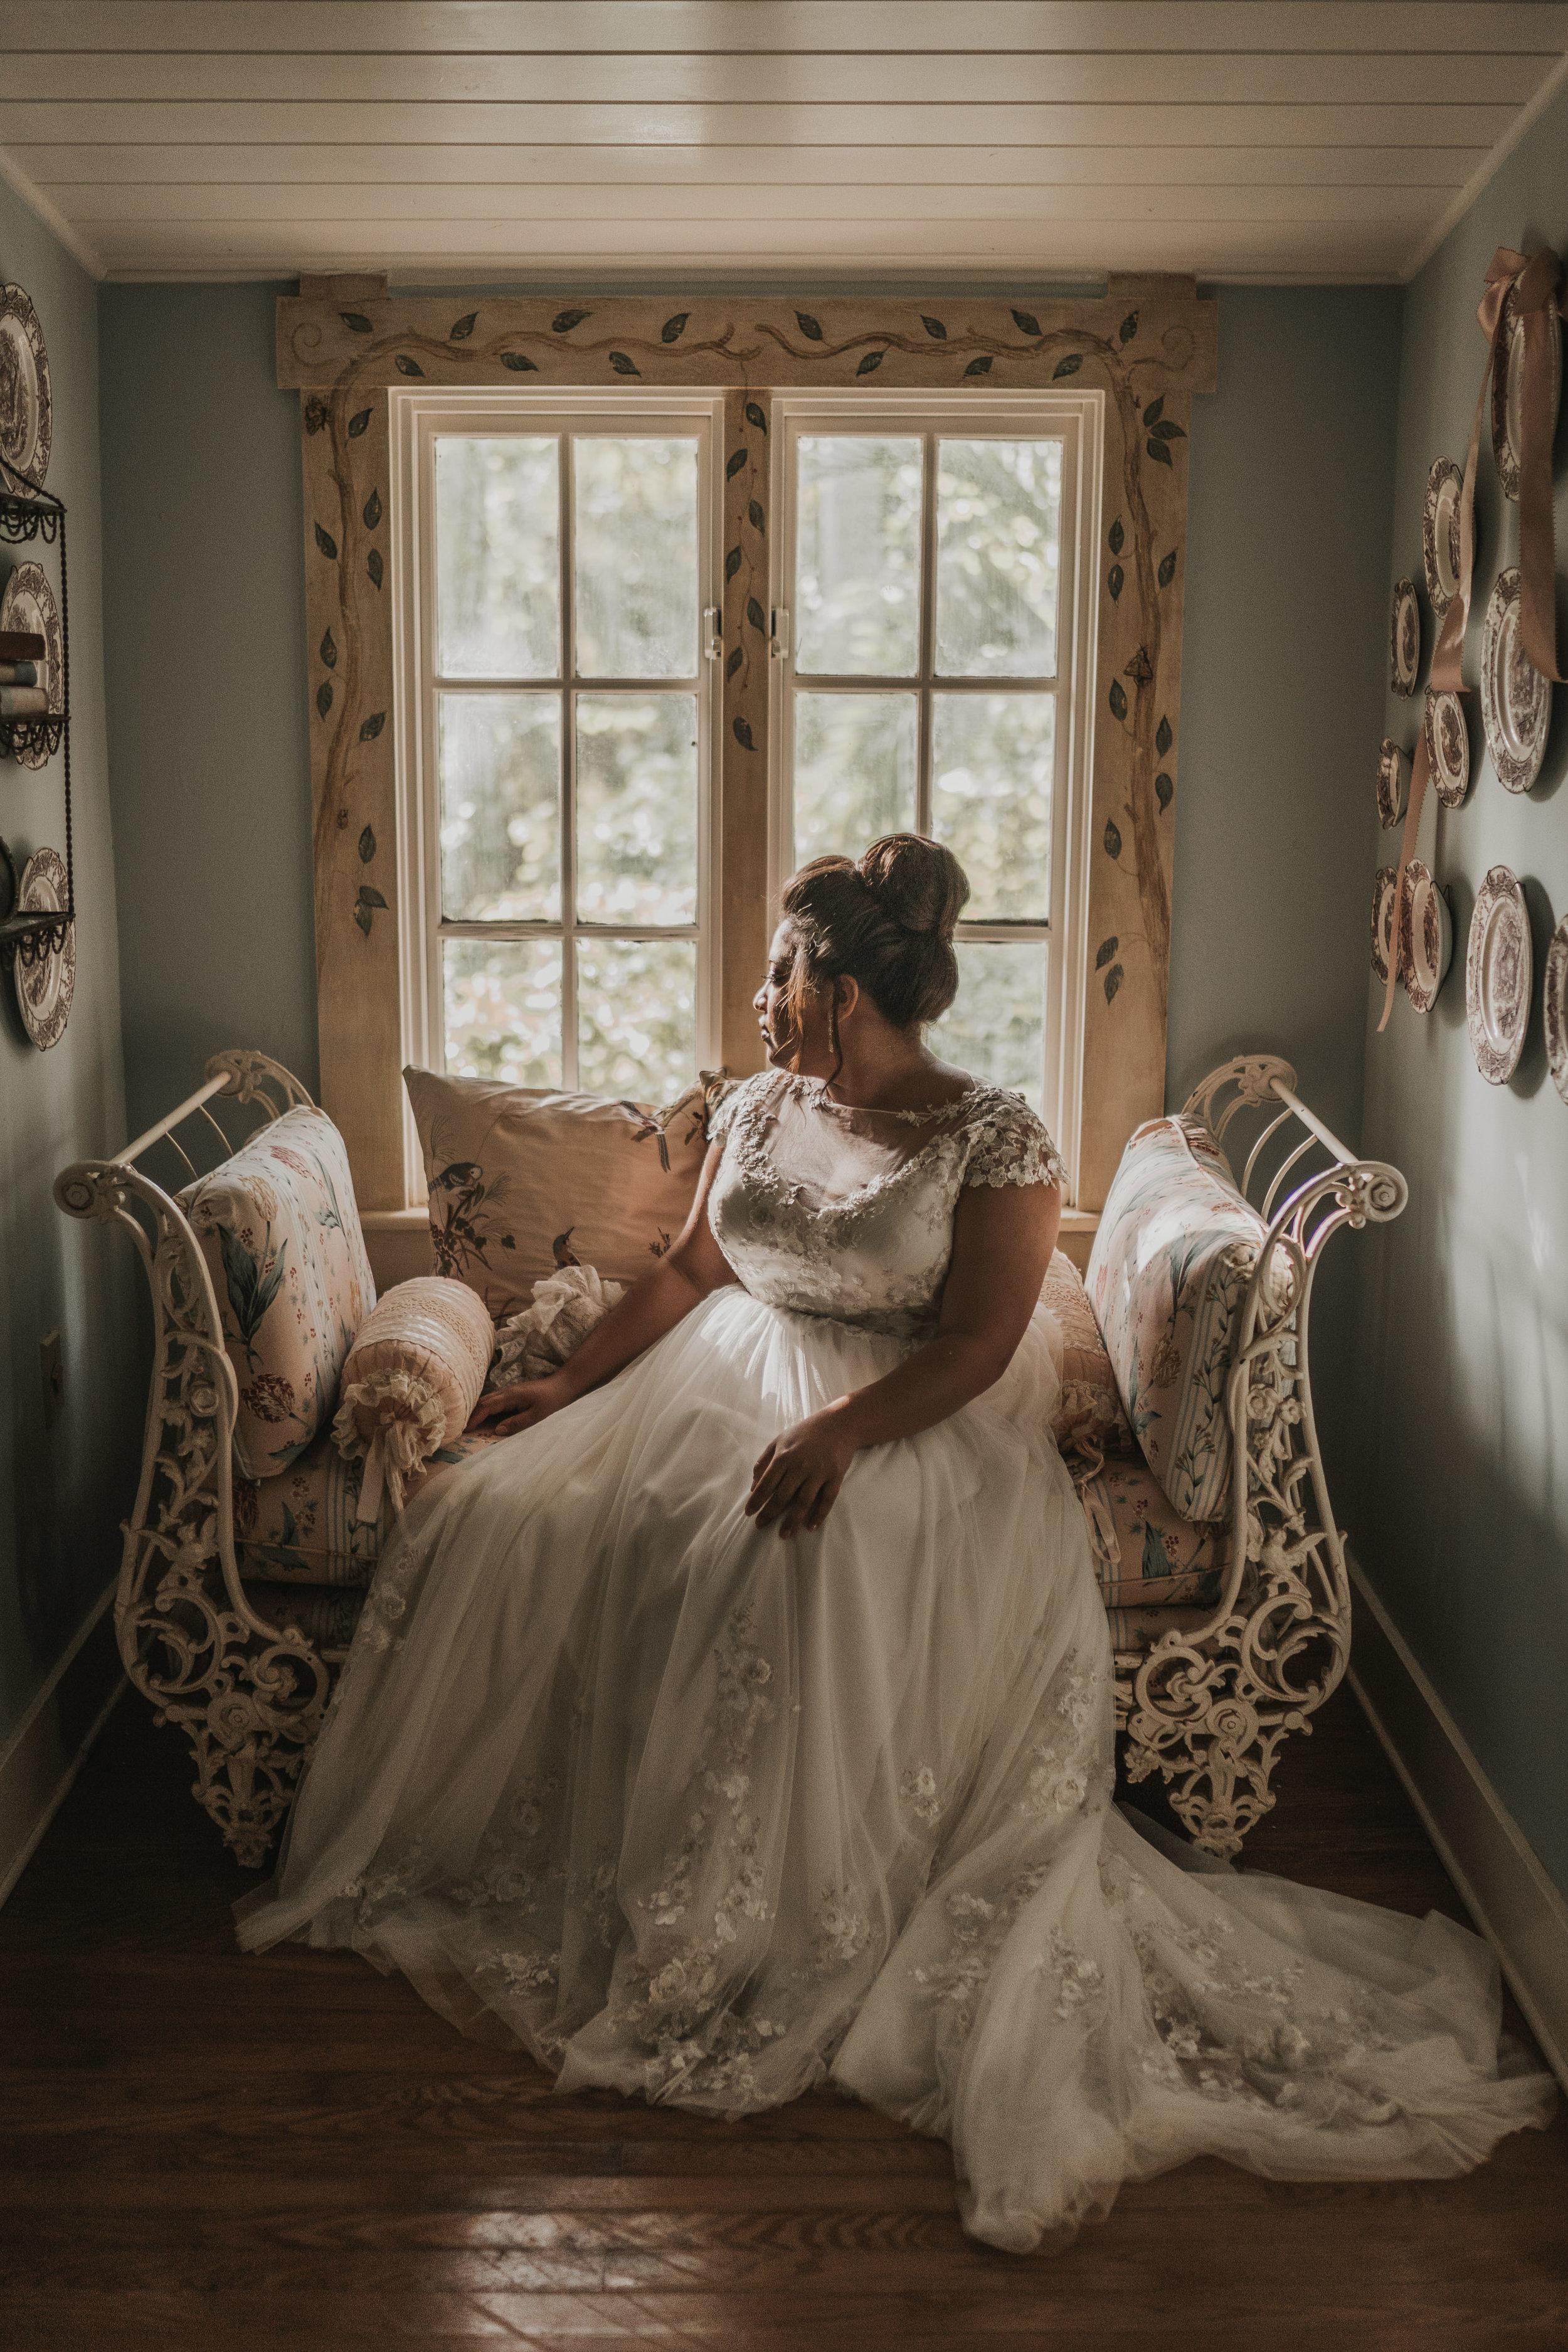 186MICHI&GABEWEDDINGDAY(WeddingFinal).jpg